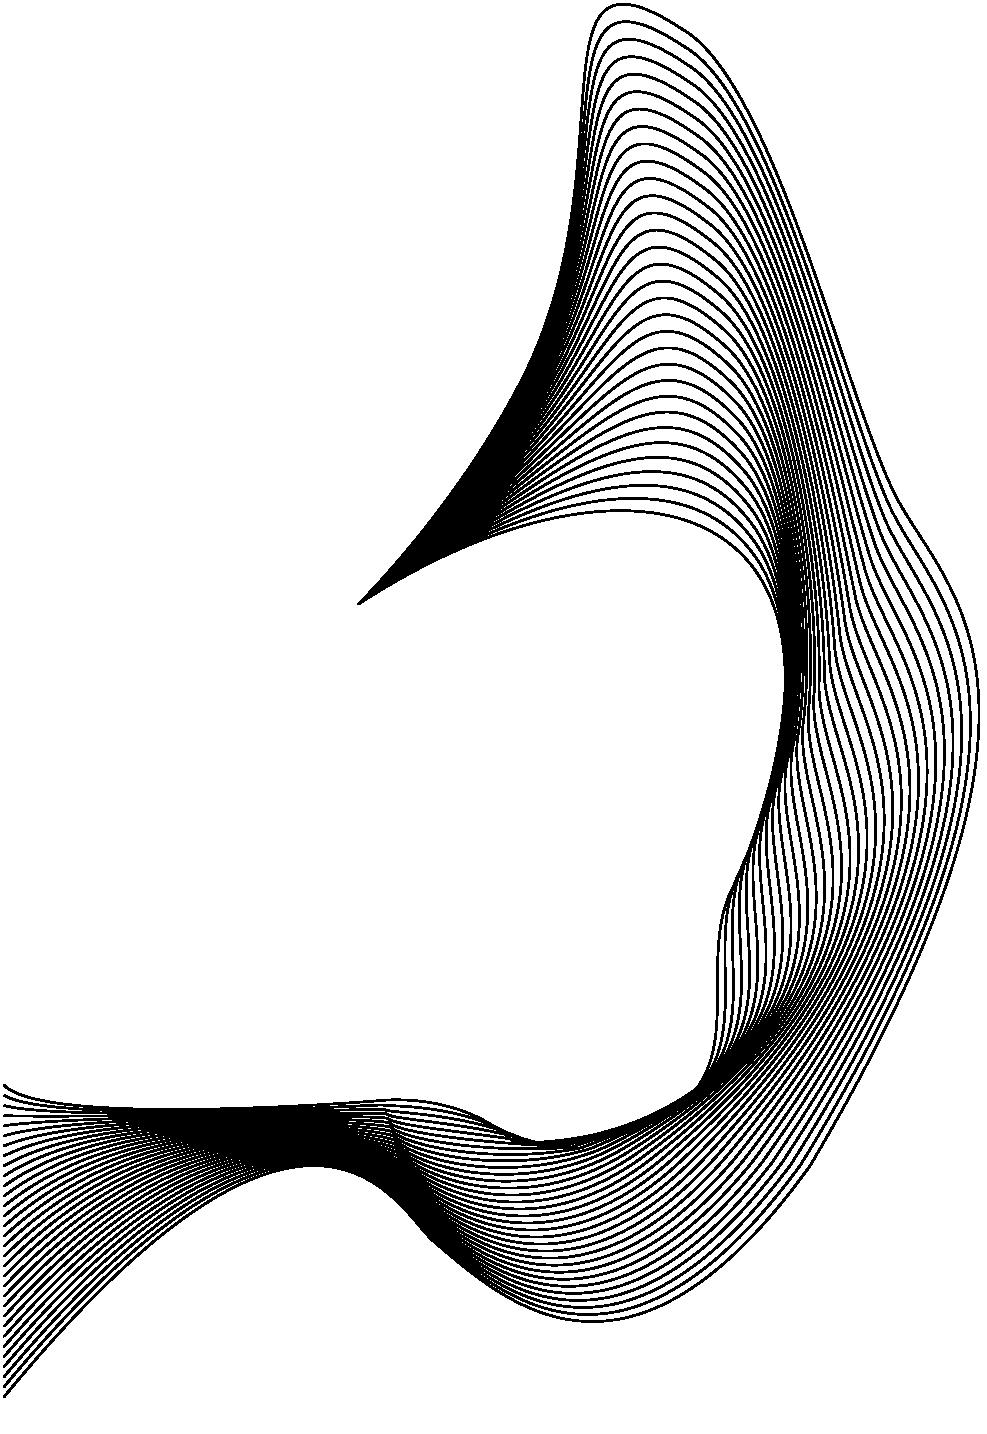 section-break-line-art-3.png